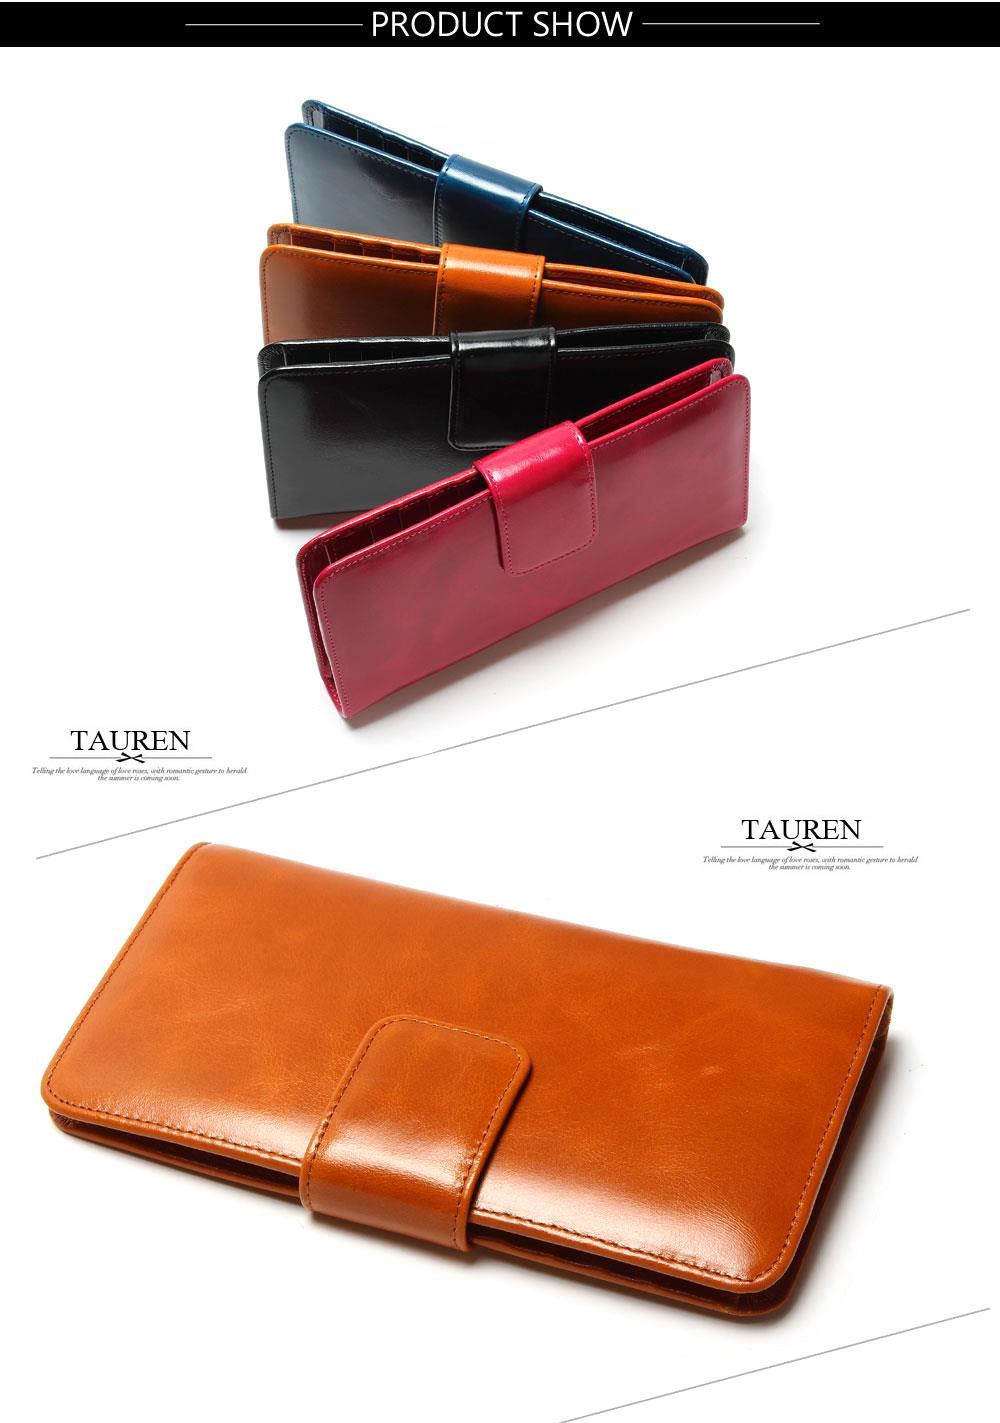 Spencers TAUREN  女性マルチカードオイルワックス革財布ロング本物の 5